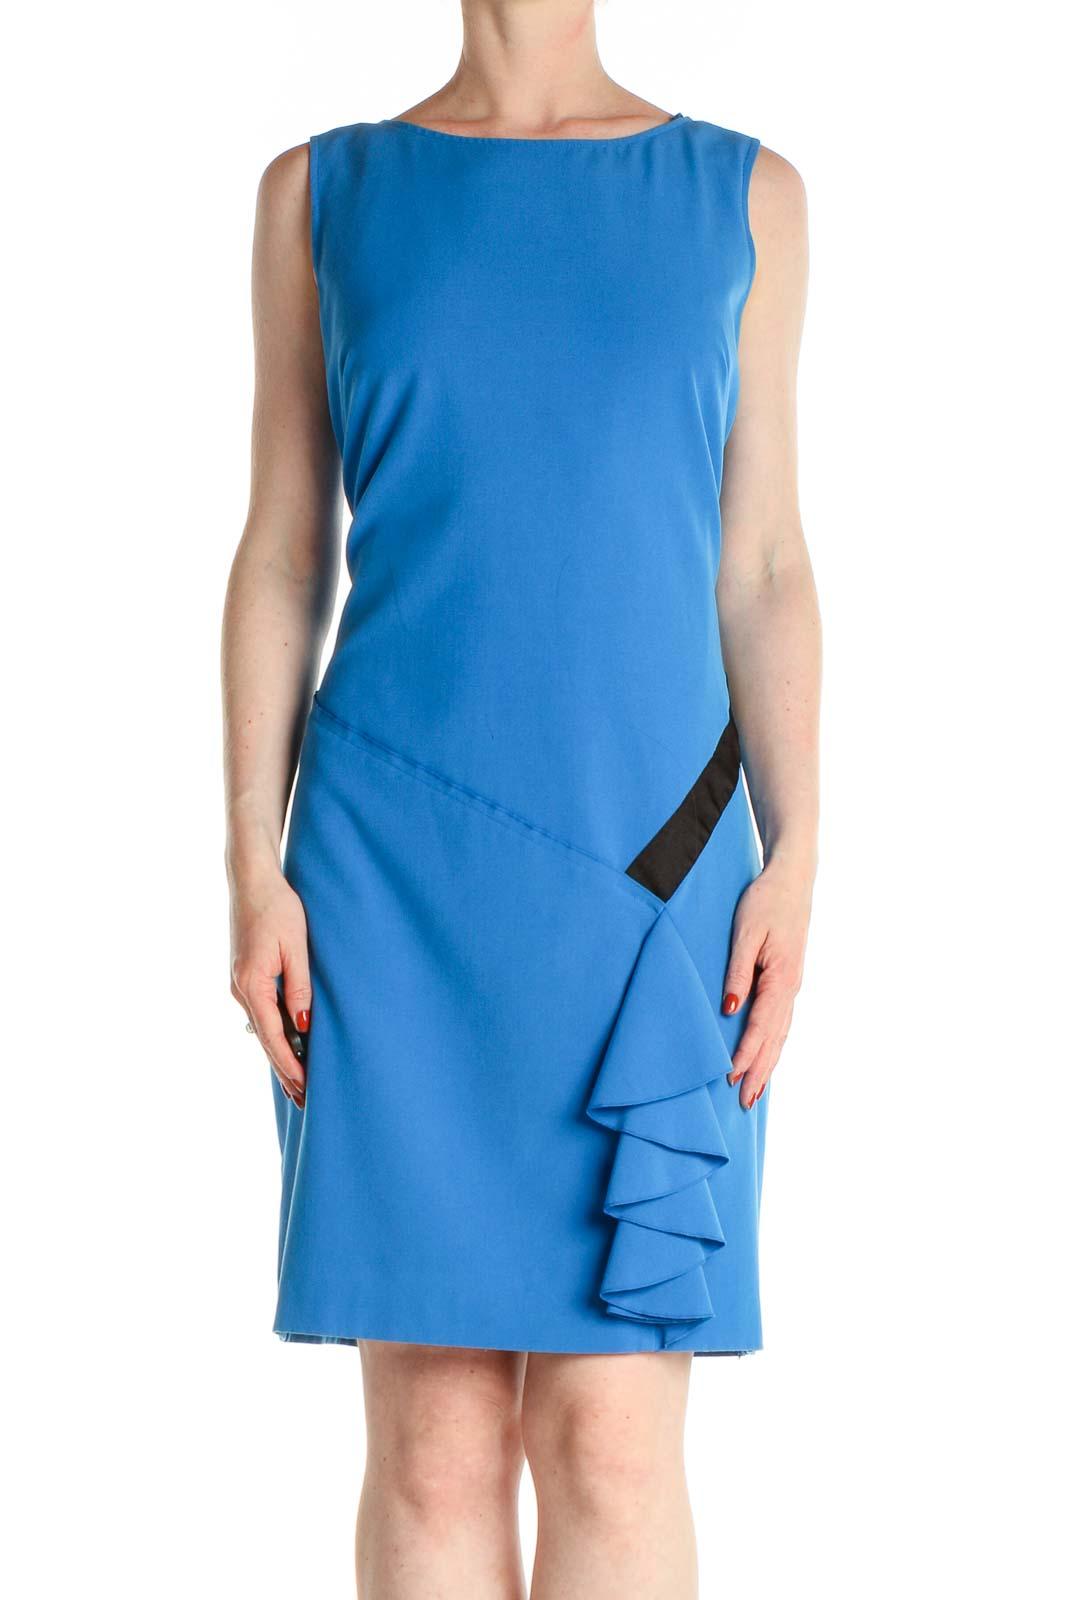 Blue Solid Work Sheath Dress Front